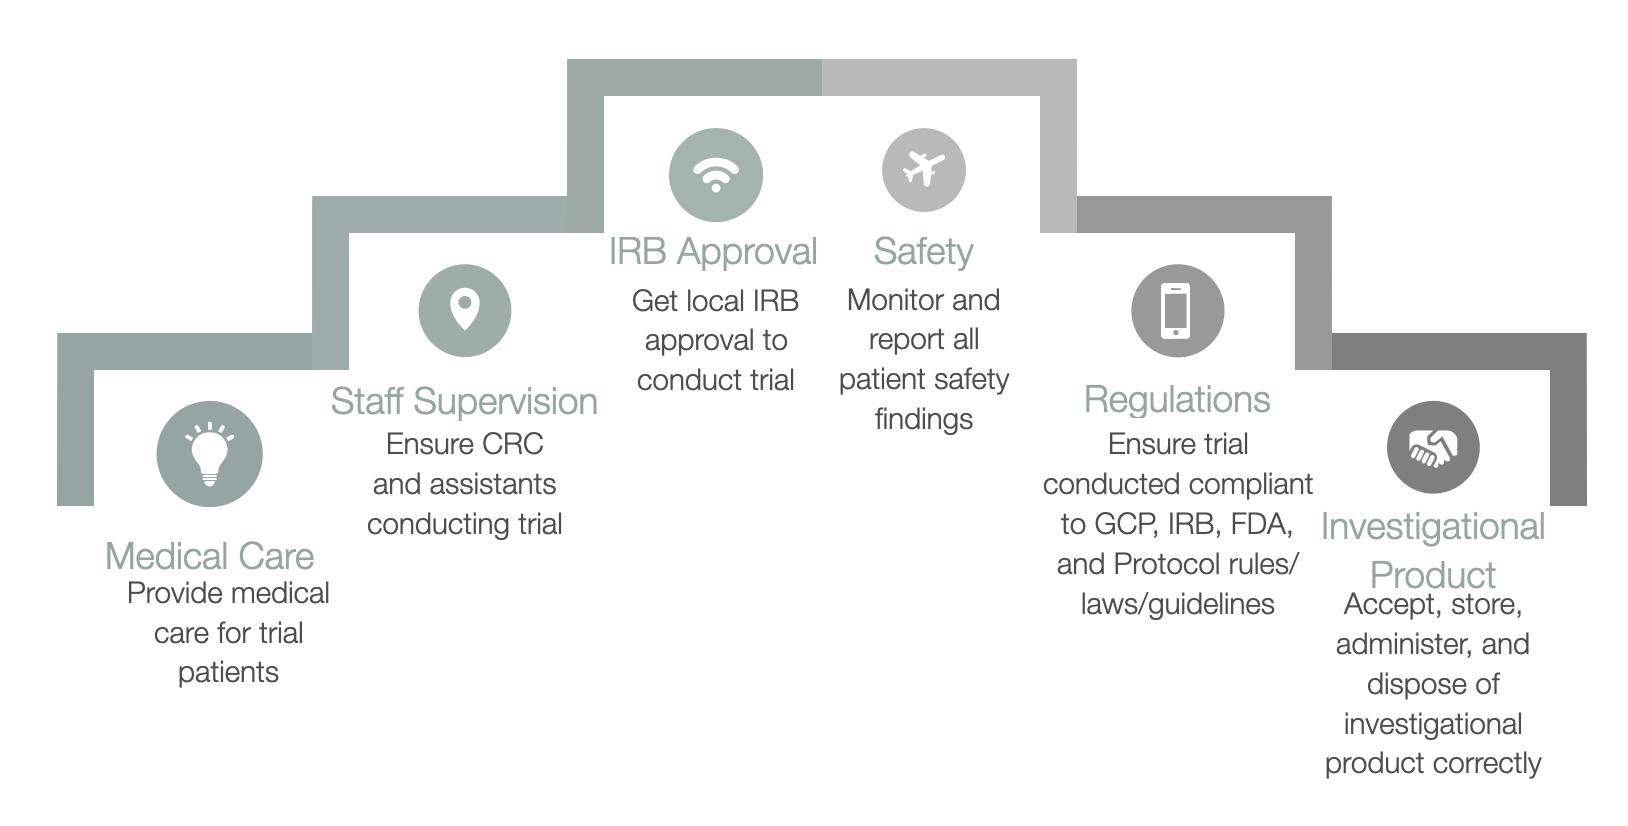 Role of Principal Investigator in Clinical Research